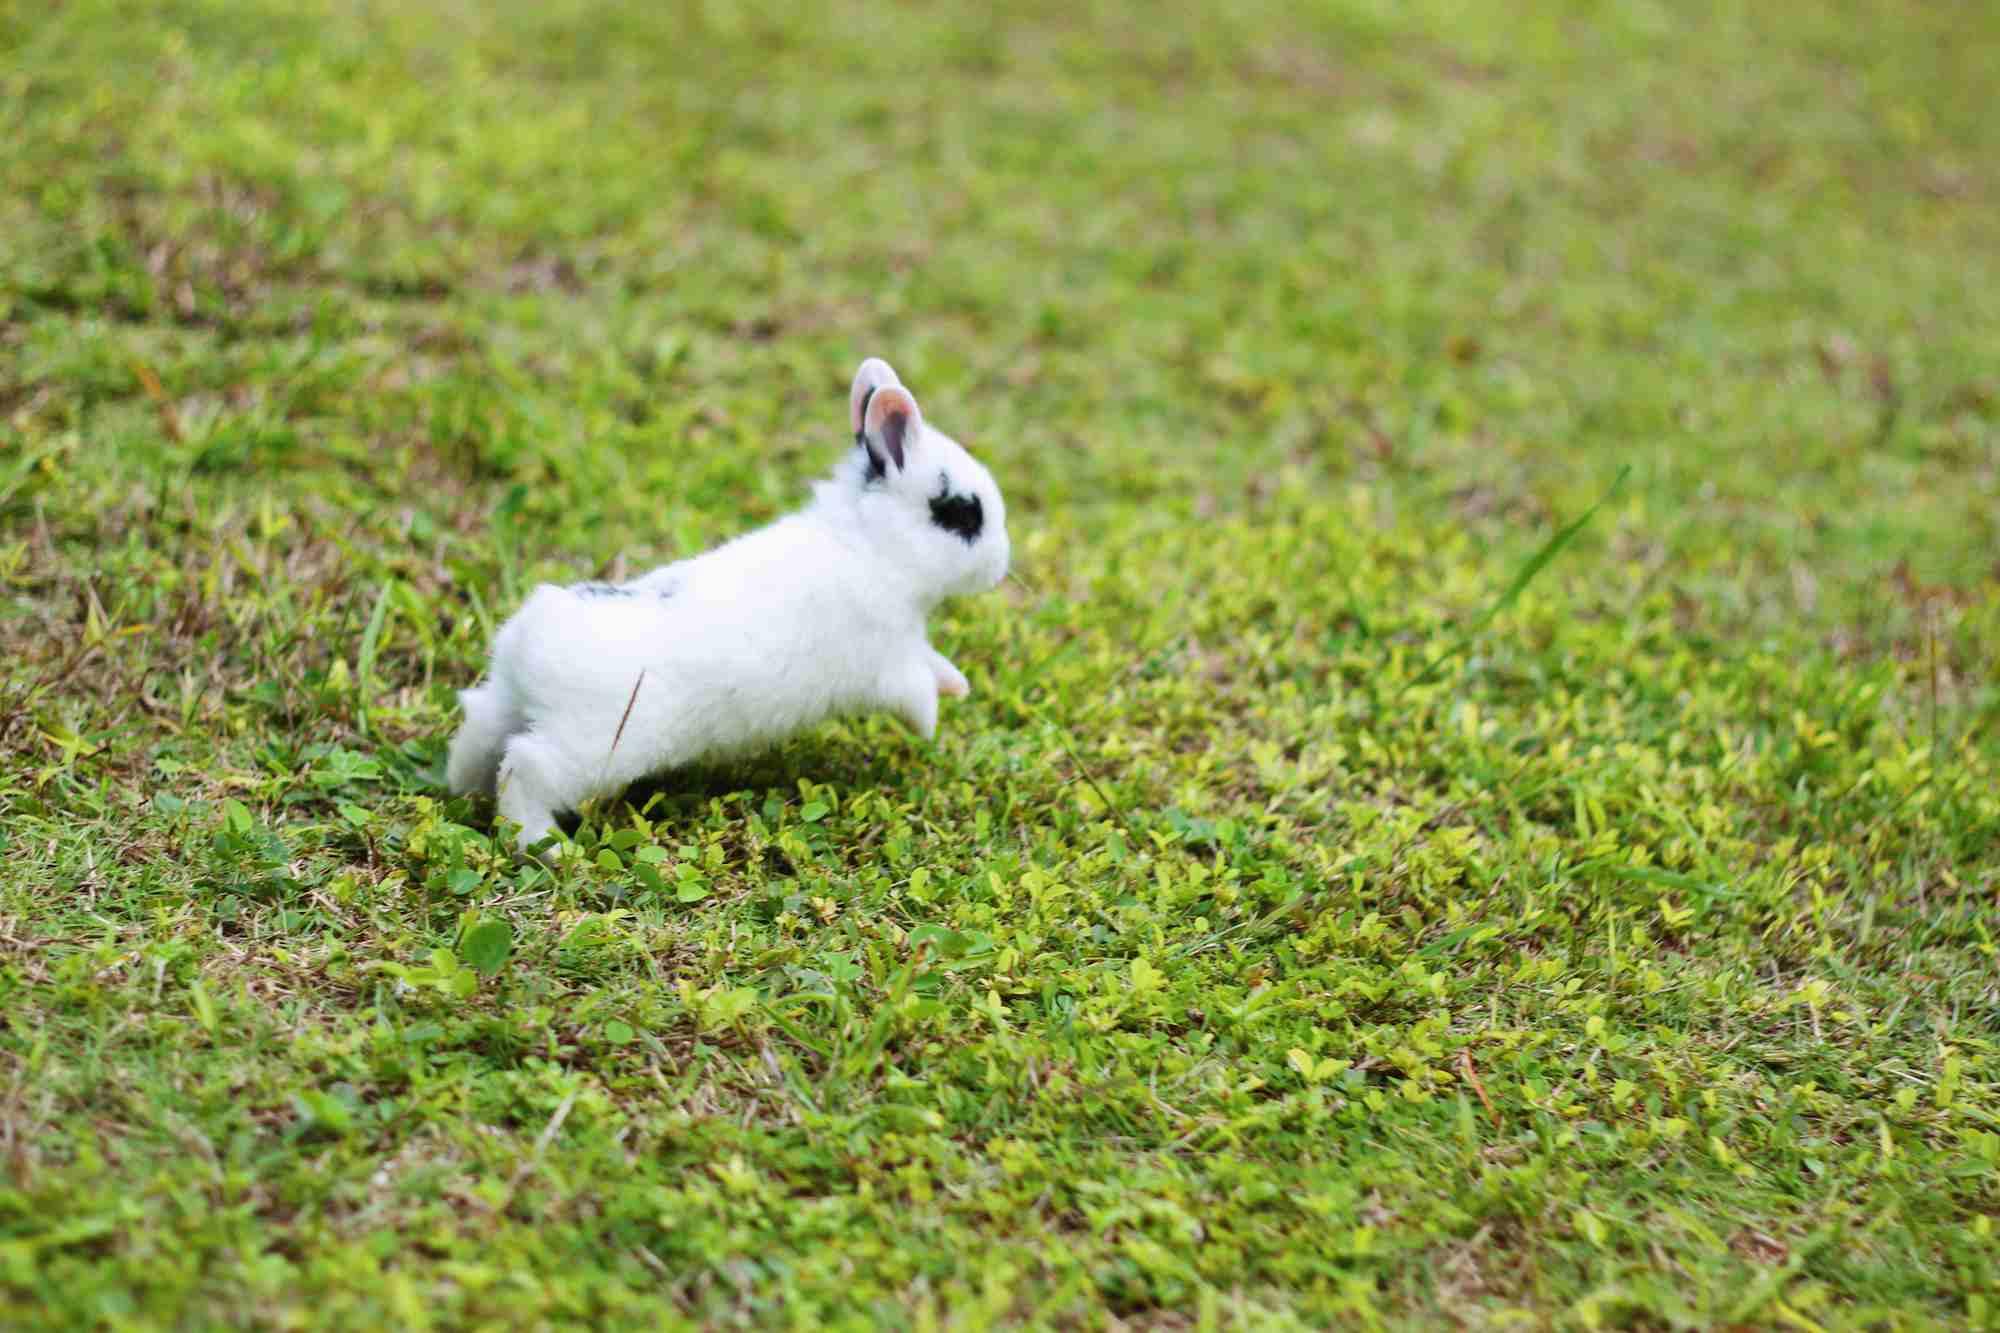 Conejo binkying